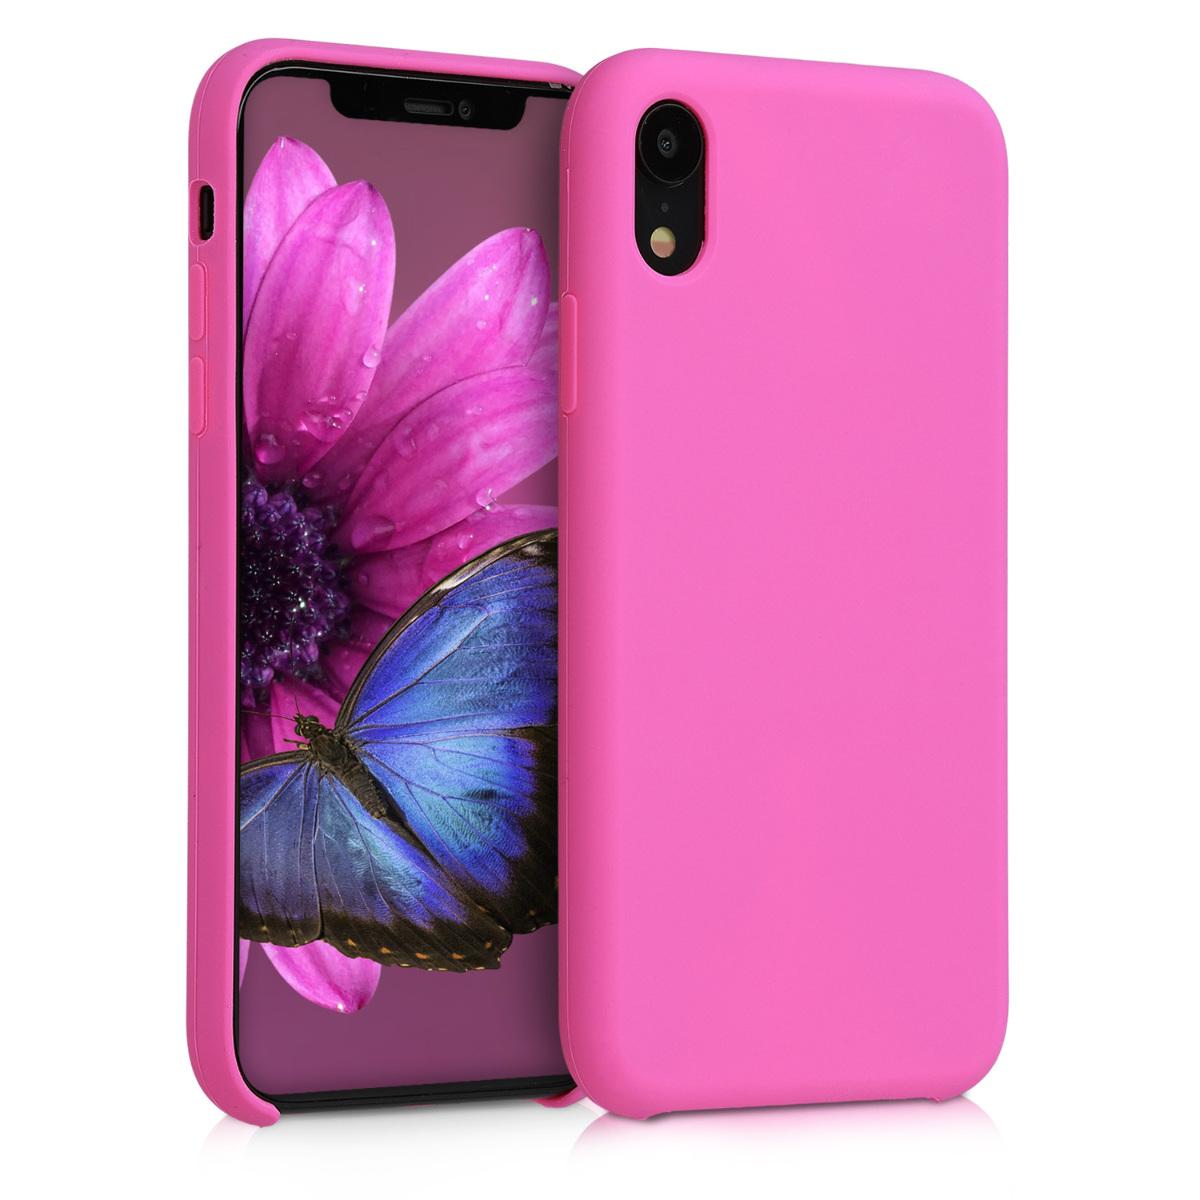 KW TPU Θήκη Σιλικόνης - Apple iPhone XR - Soft Flexible Rubber Protective Cover - Magenta (45910.135)